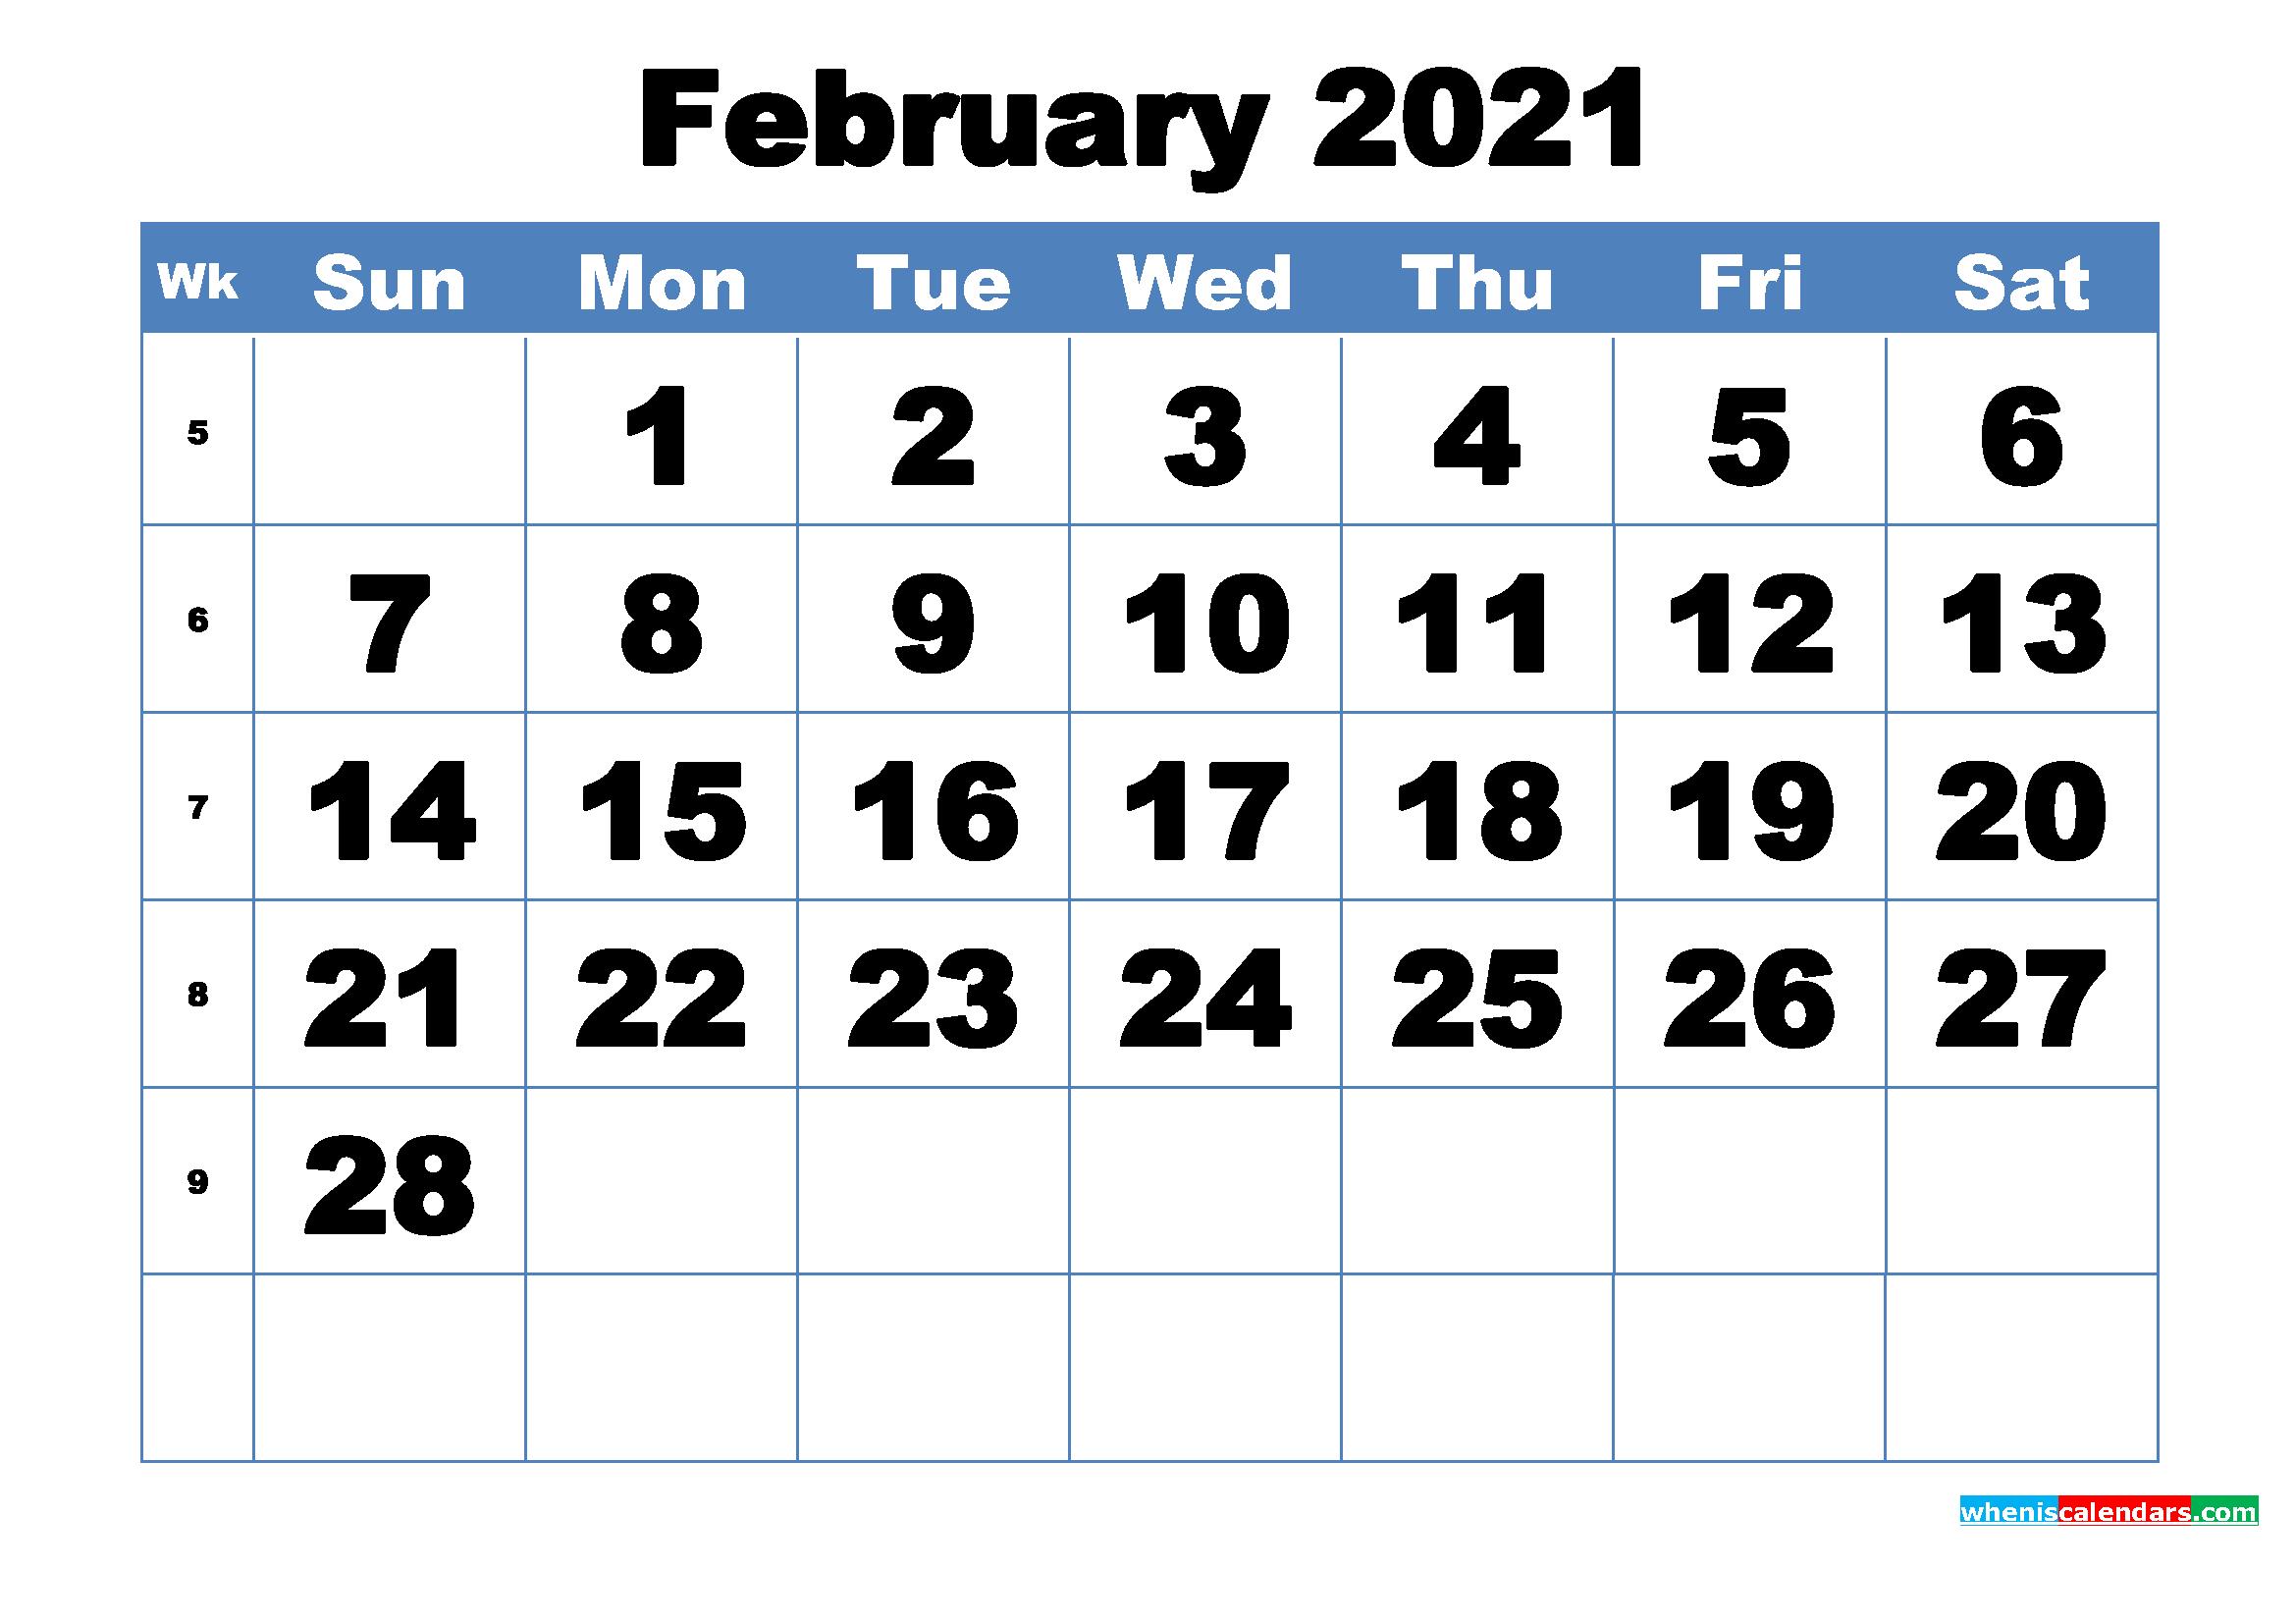 Free Printable February 2021 Calendar Template Word, Pdf  February 2021 Calendar Printable